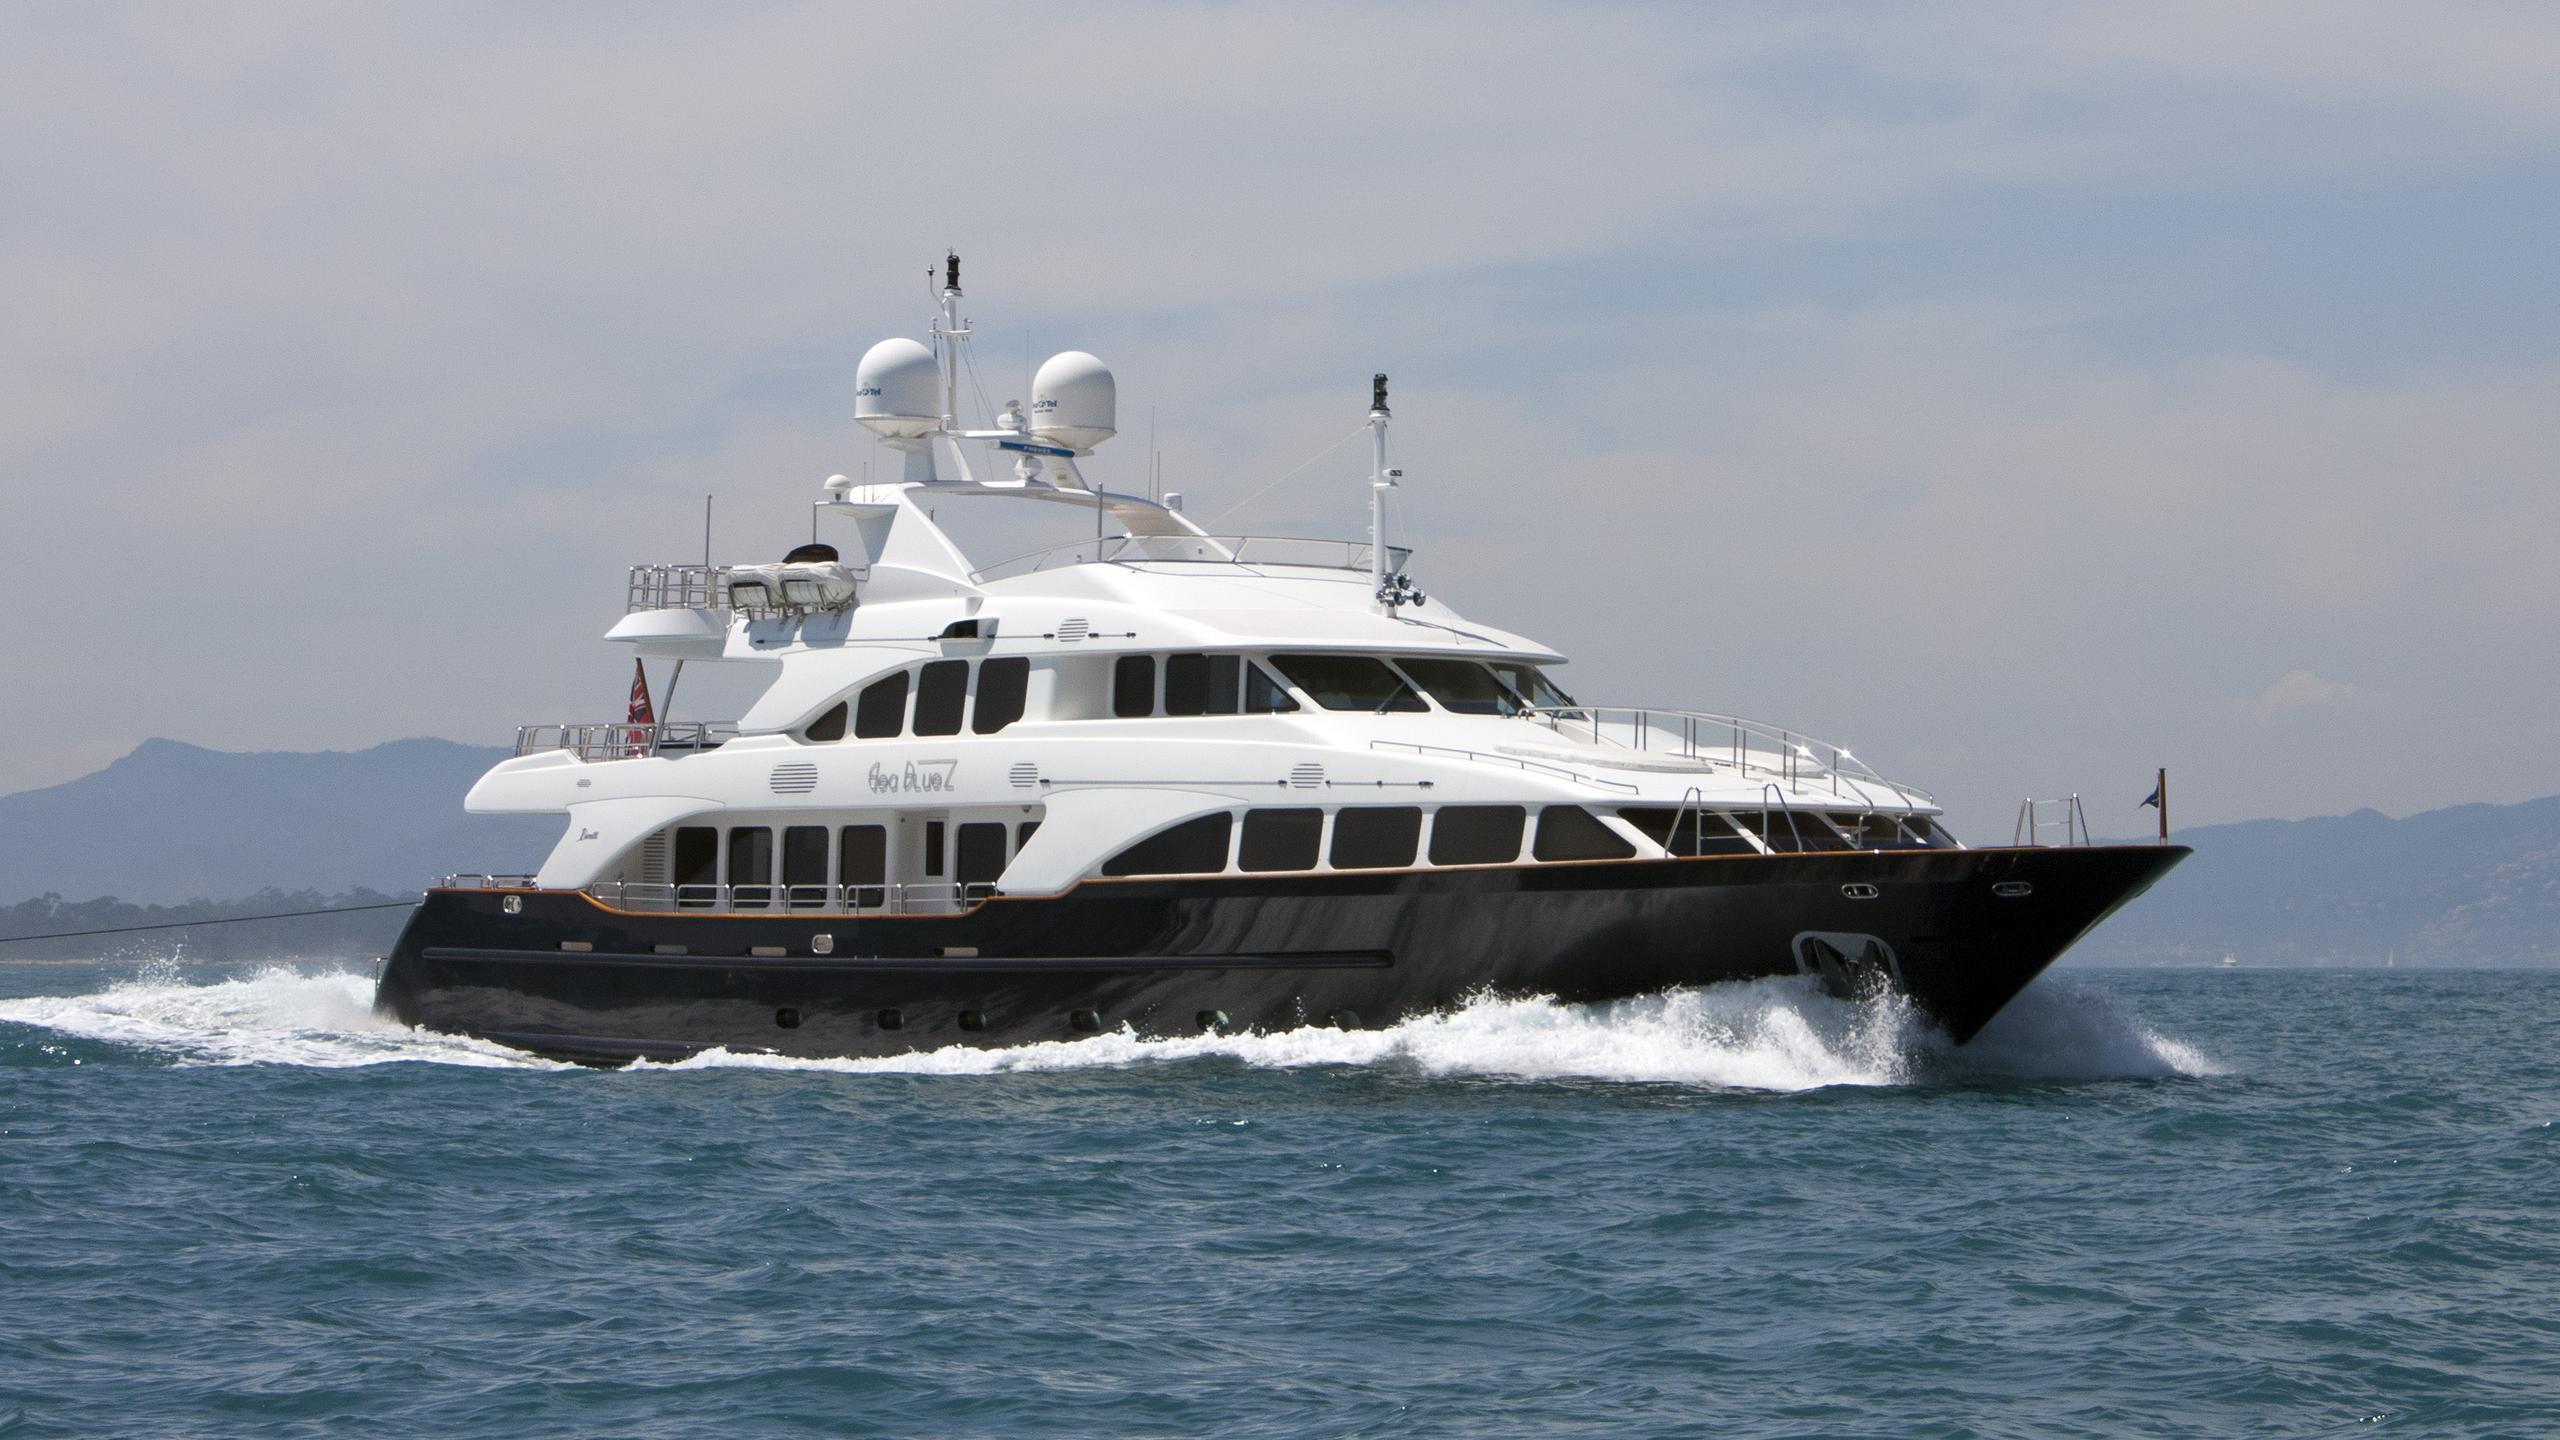 sea-bluez-motor-yacht-Benetti-Classic-120-2006-37m-cruising